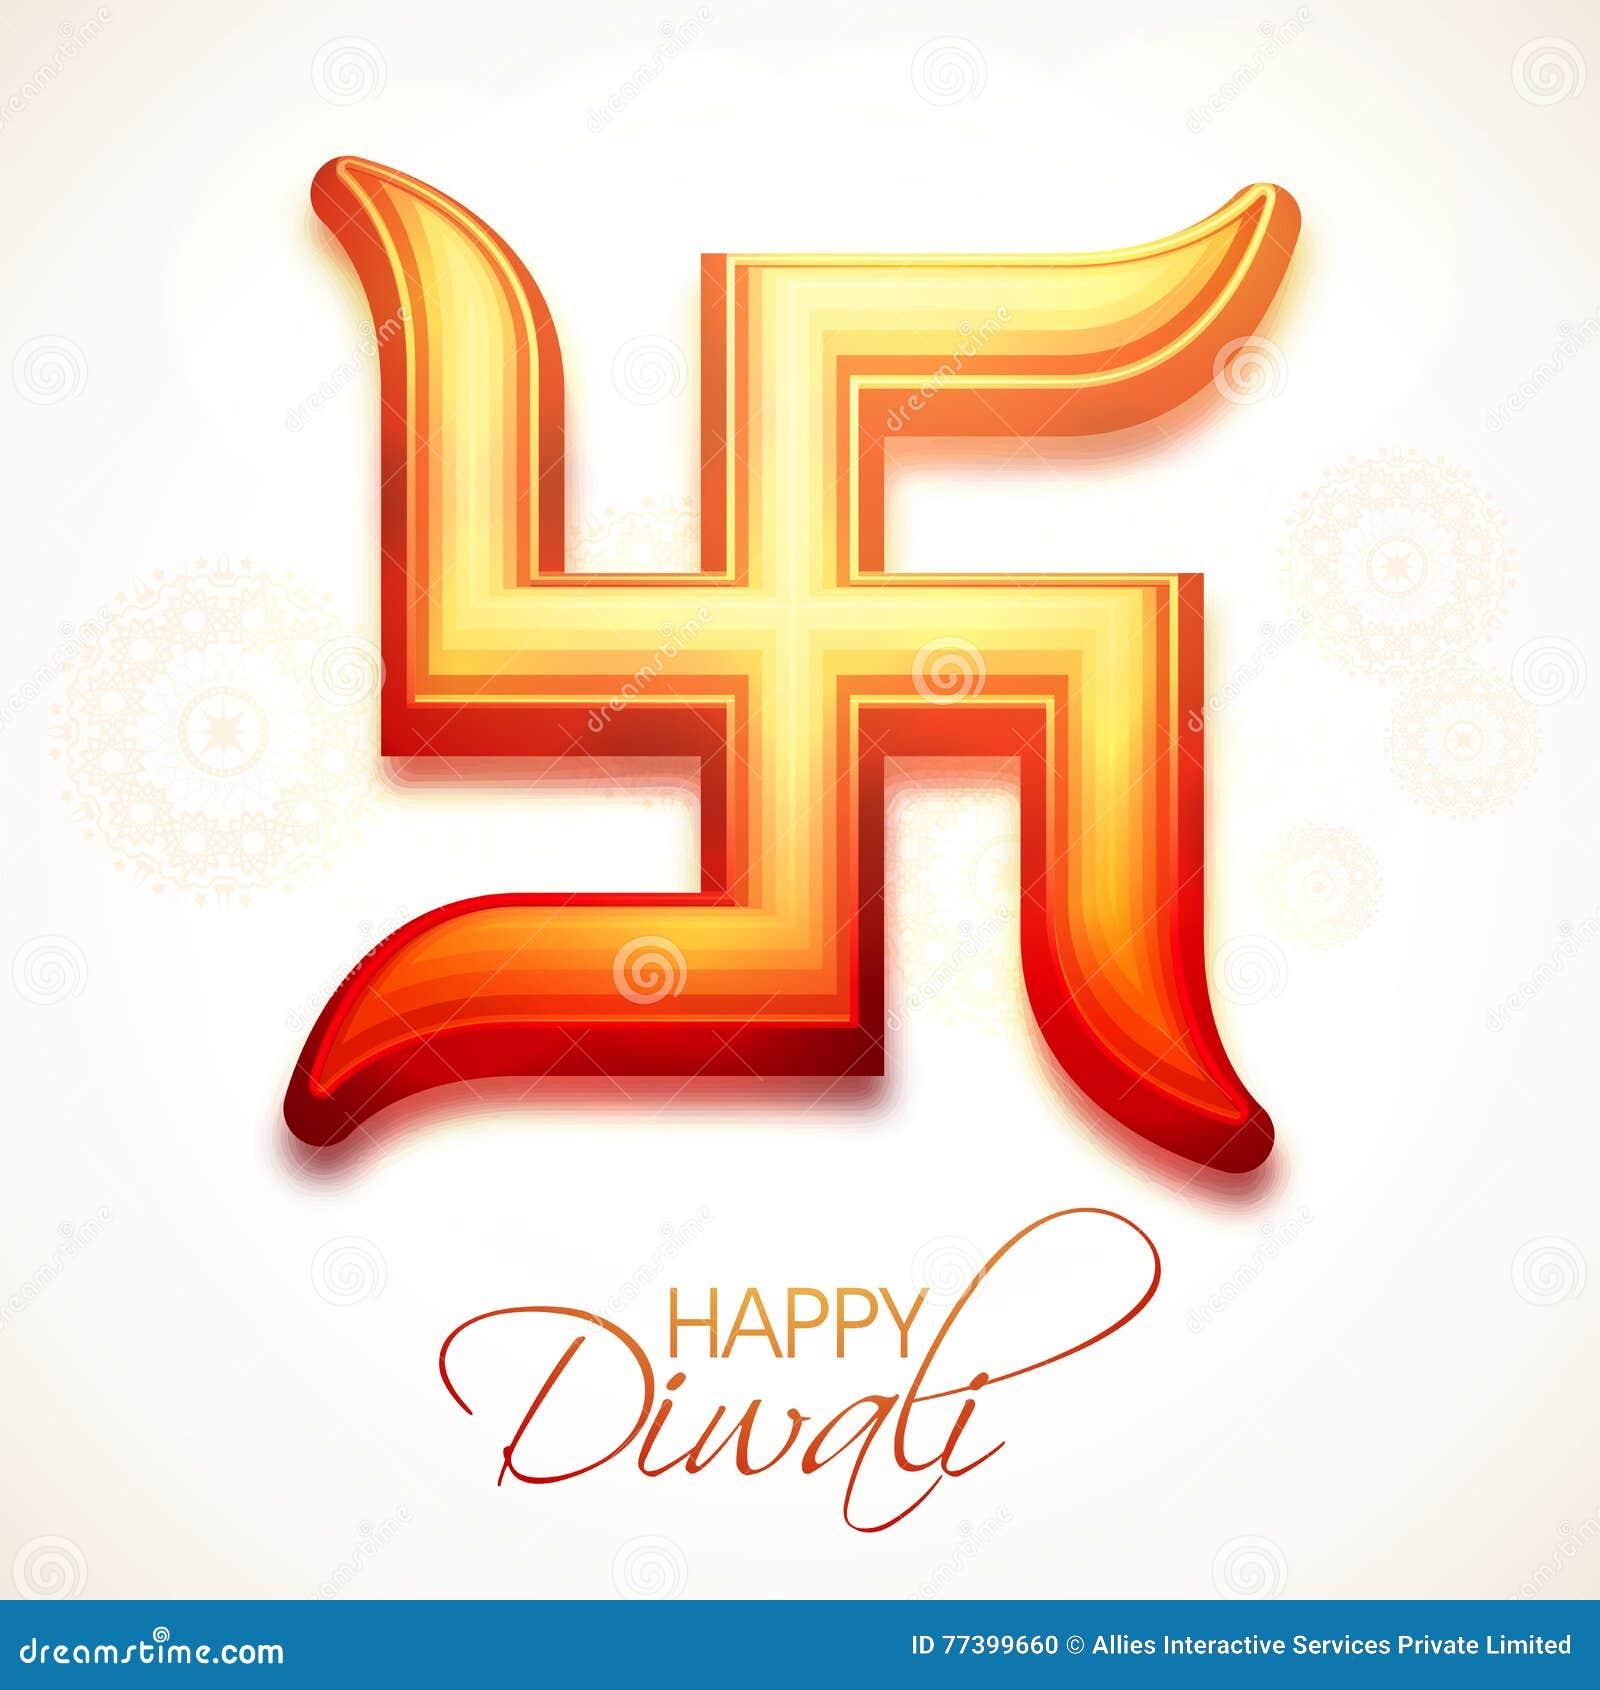 3d Swastika Symbol For Happy Diwali Stock Illustration